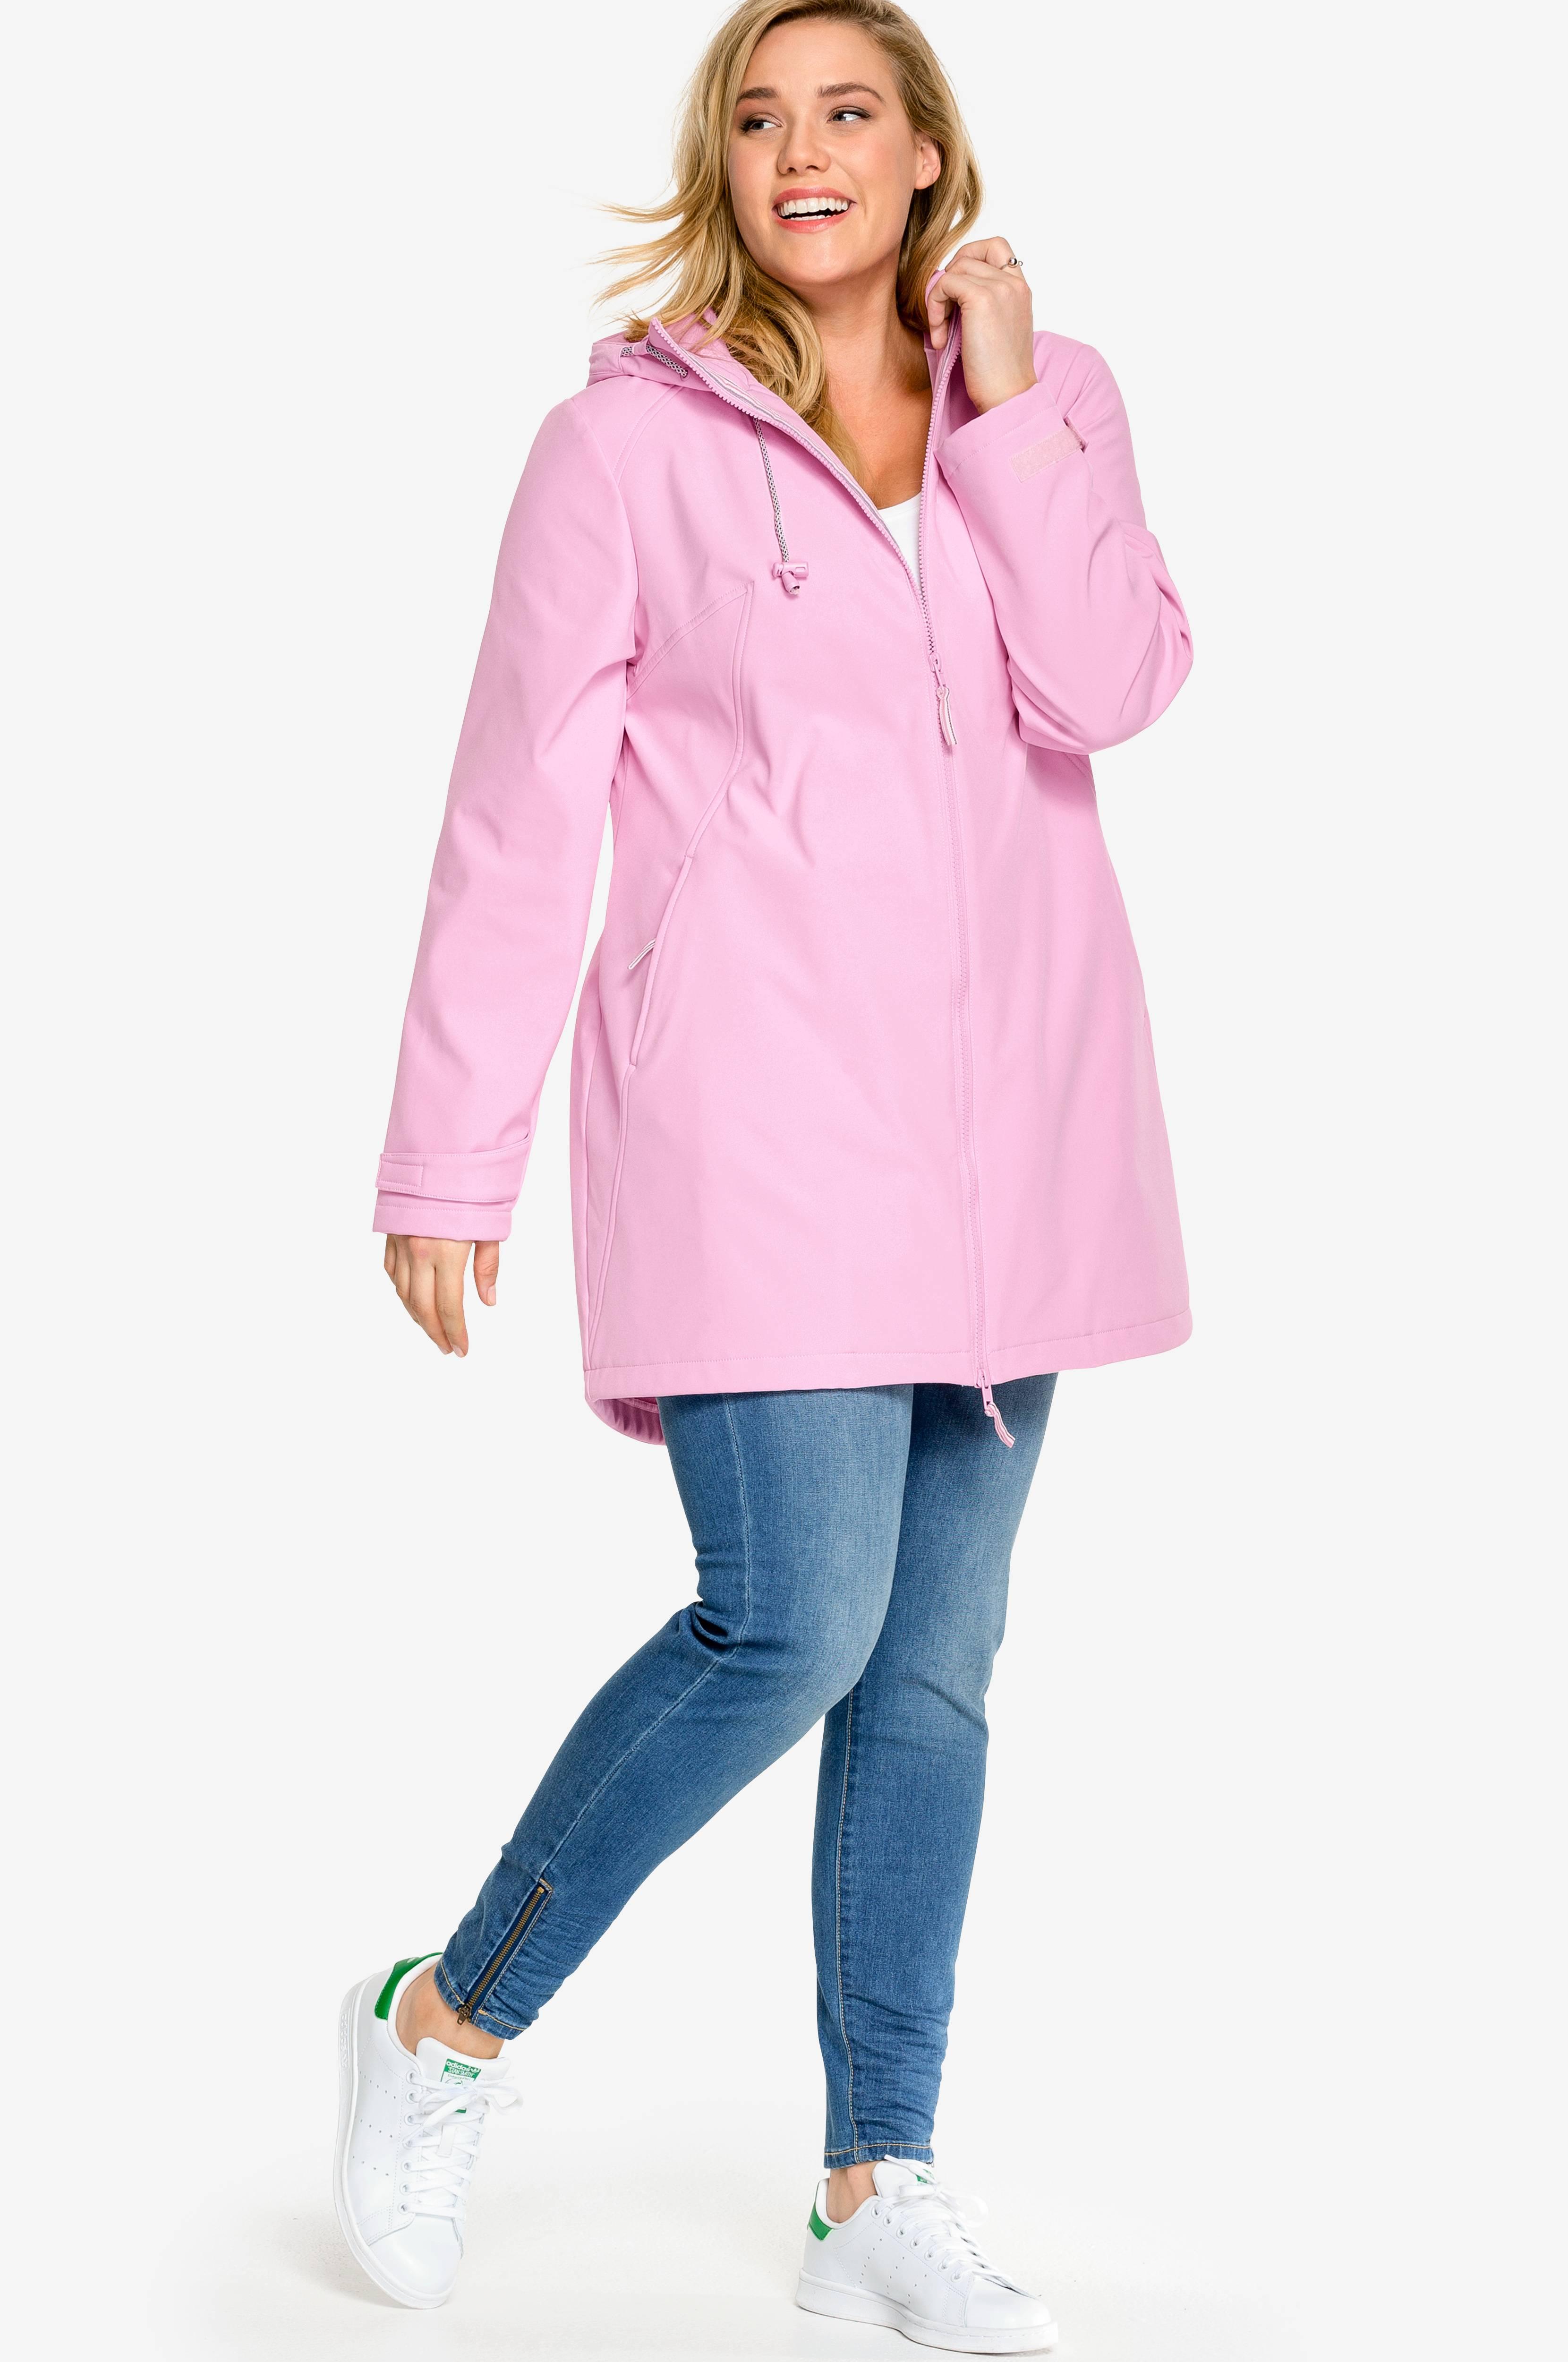 53a78a16 Ellos Plus collection Softshell-jakke med hætte - Rosa - Dame - Ellos.dk